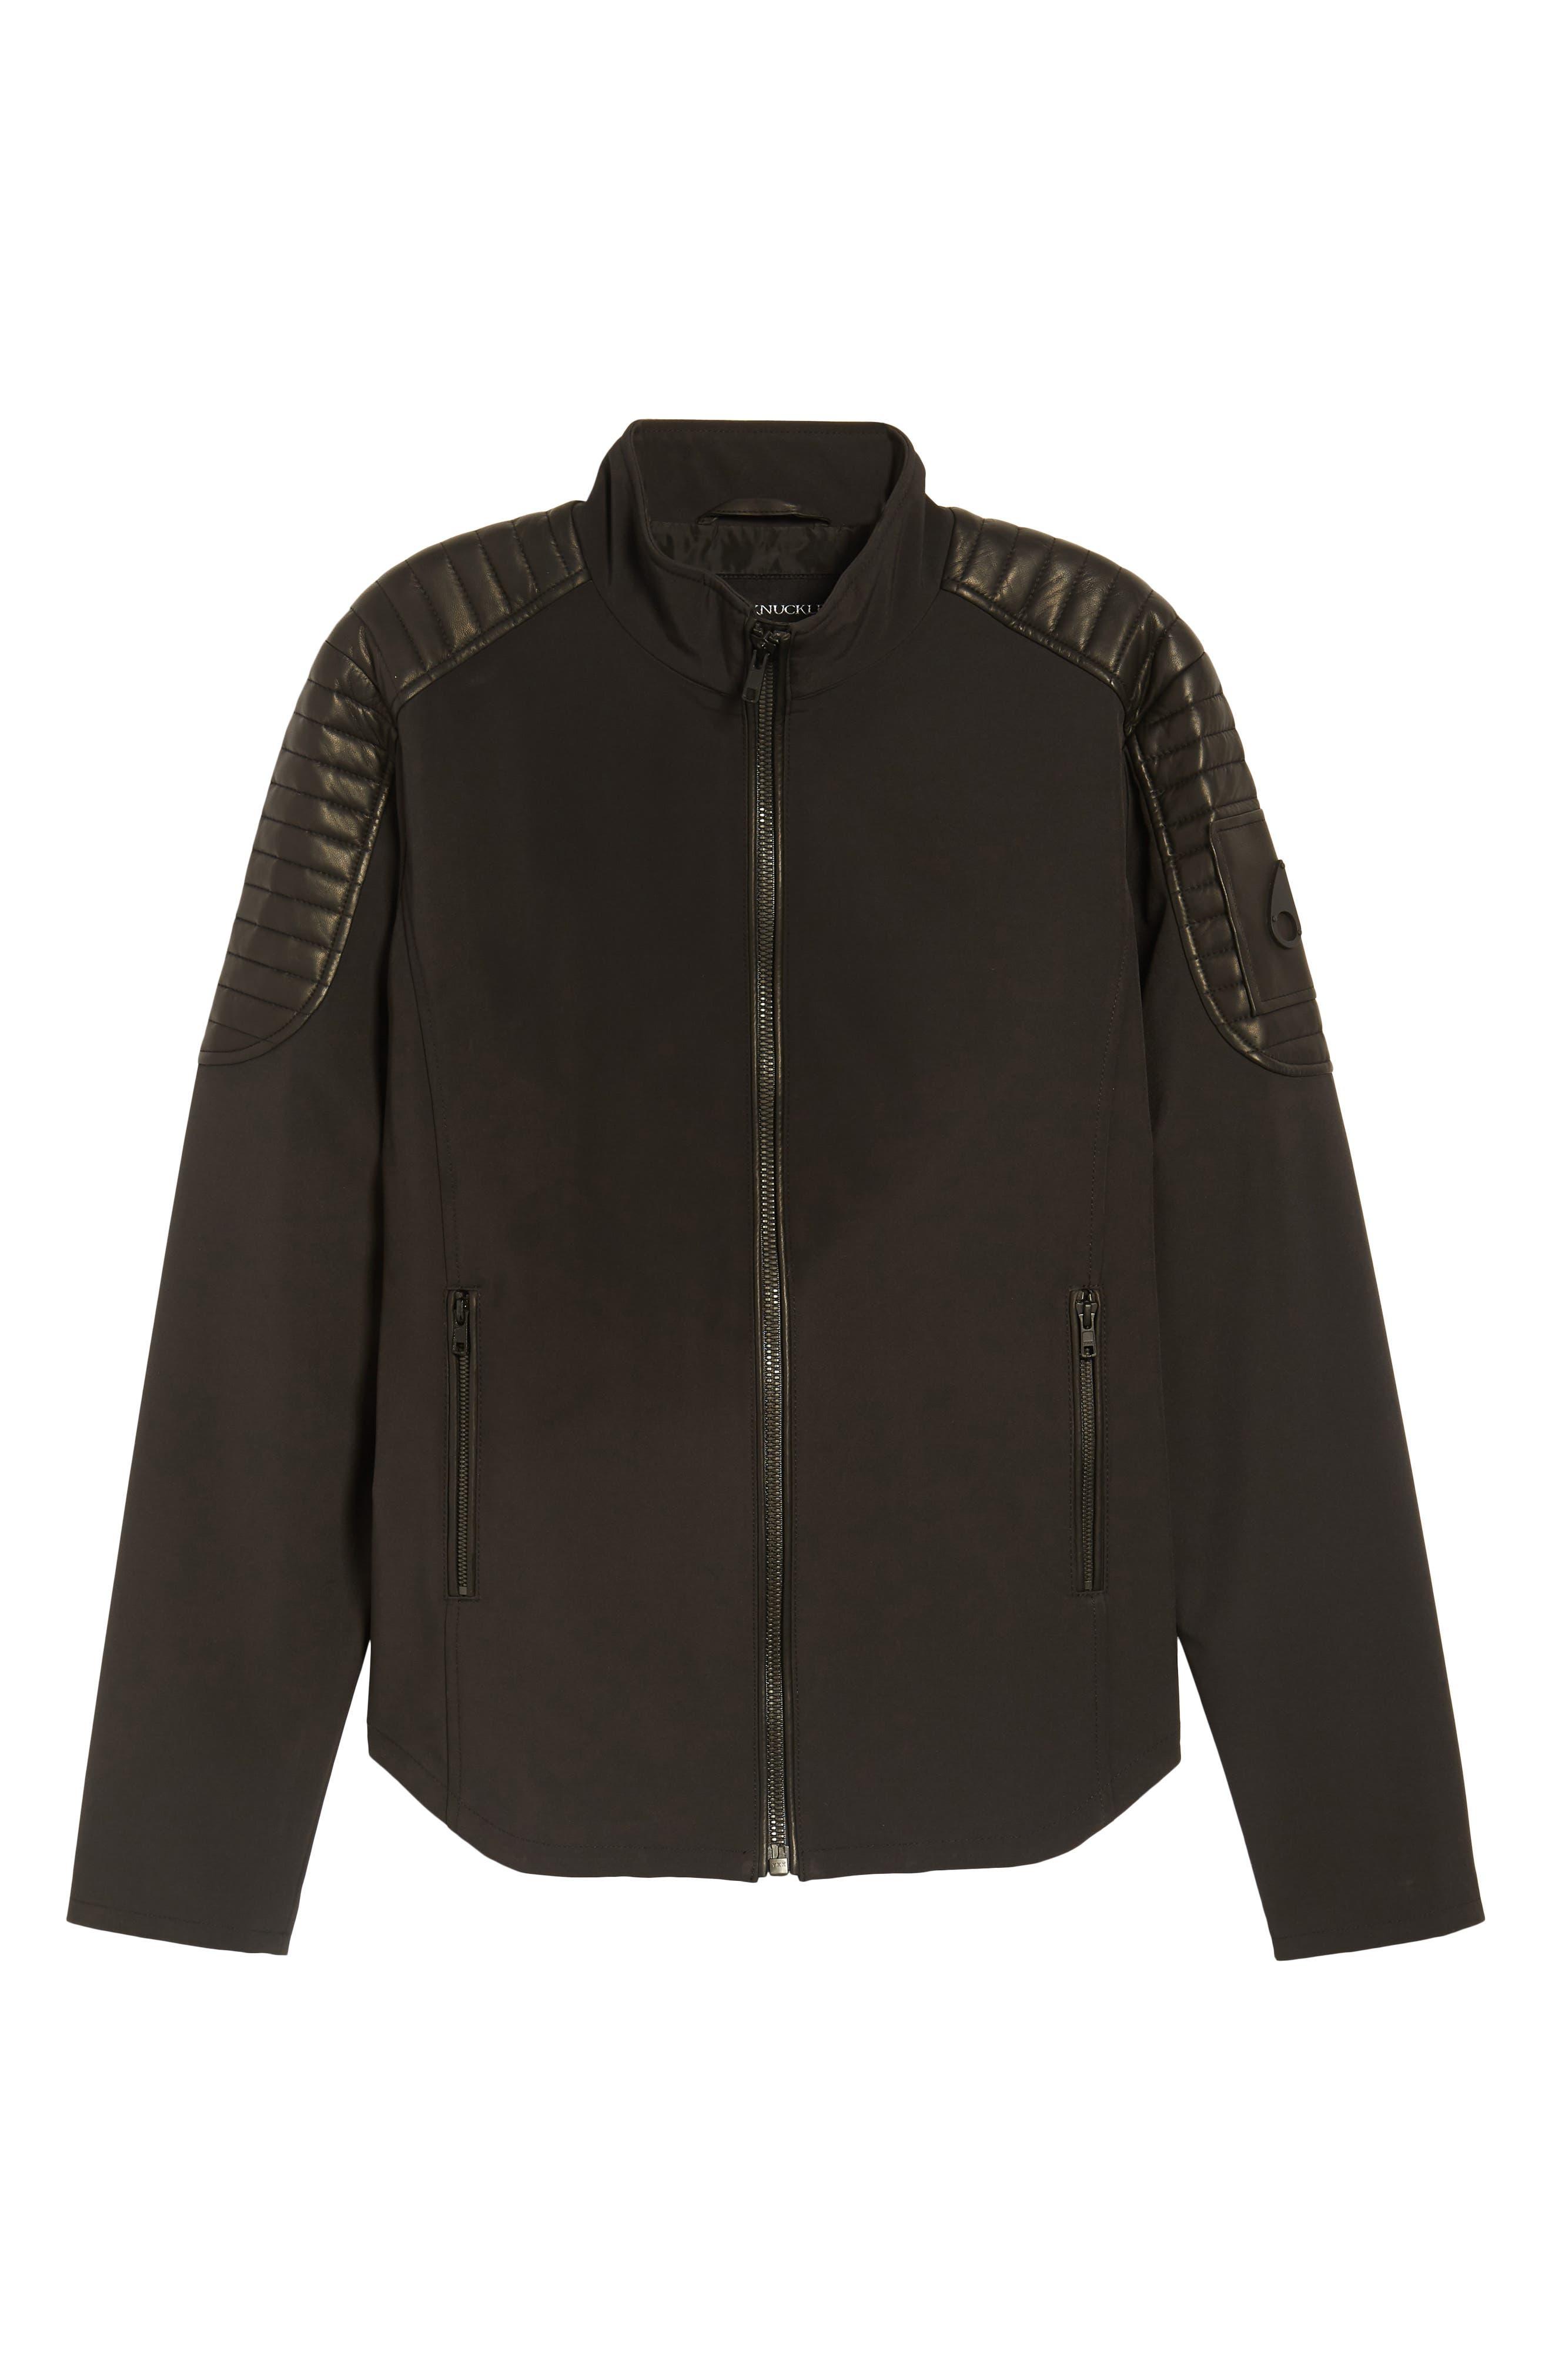 Grindstone Water Repellent Jacket,                             Alternate thumbnail 6, color,                             Black